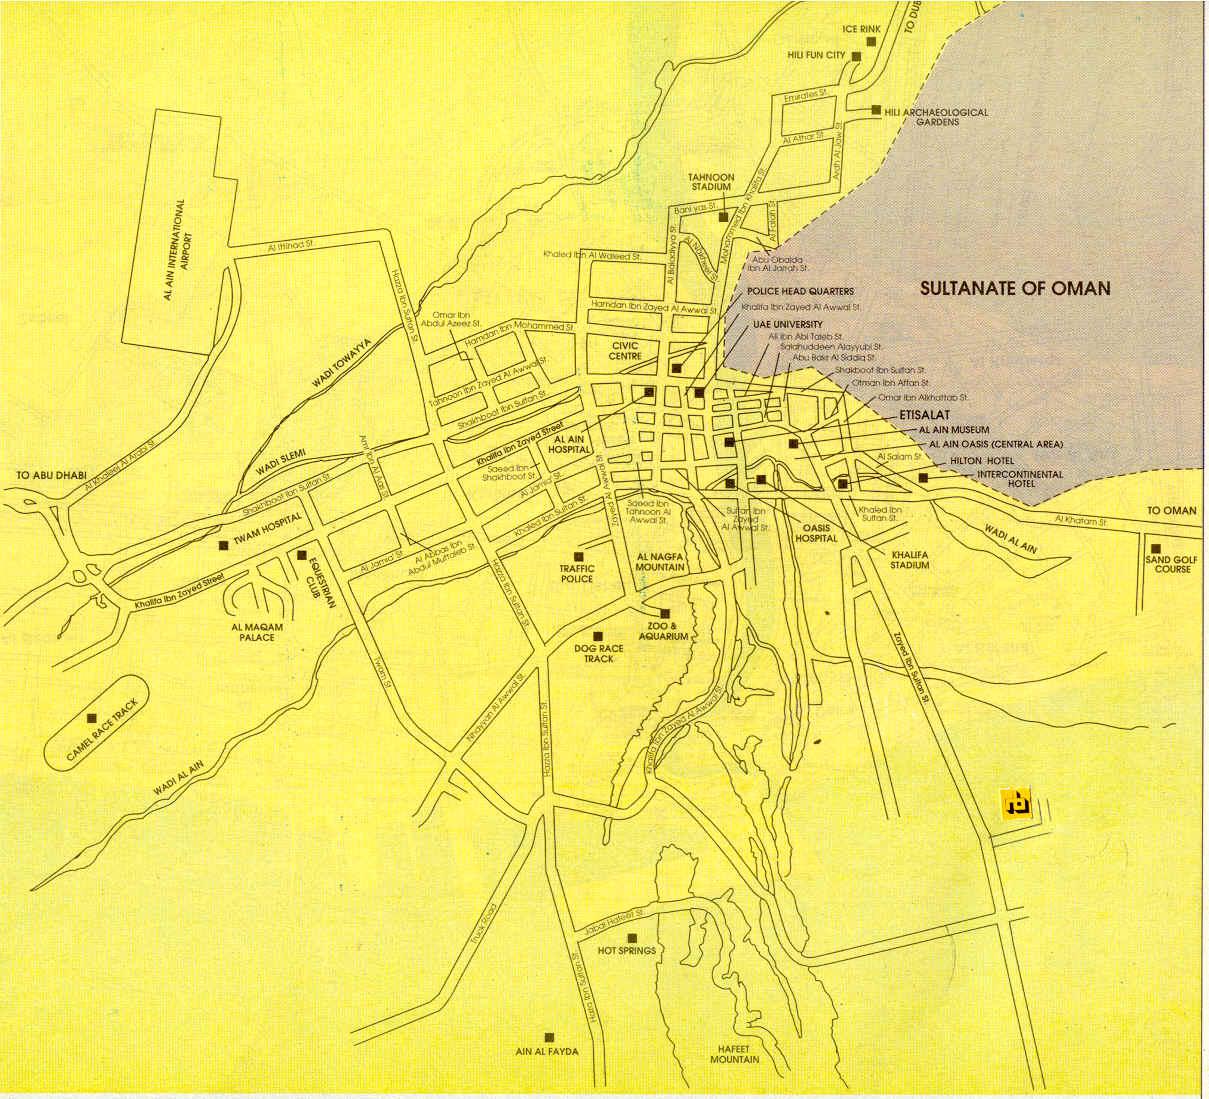 Mapa de Al Ain, Abu Dhabi EAU